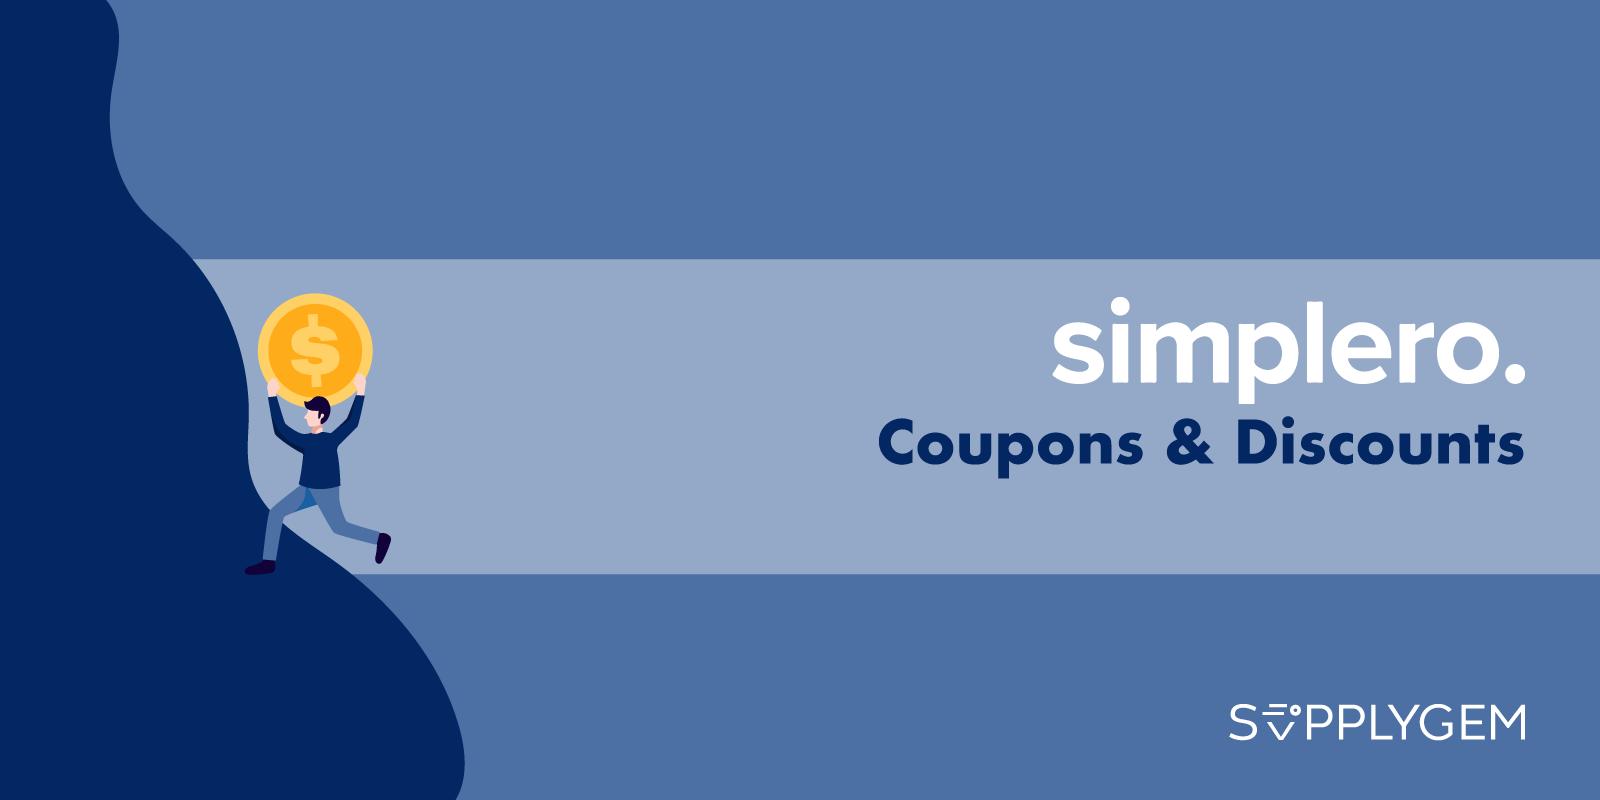 Simplero Coupons & Discounts